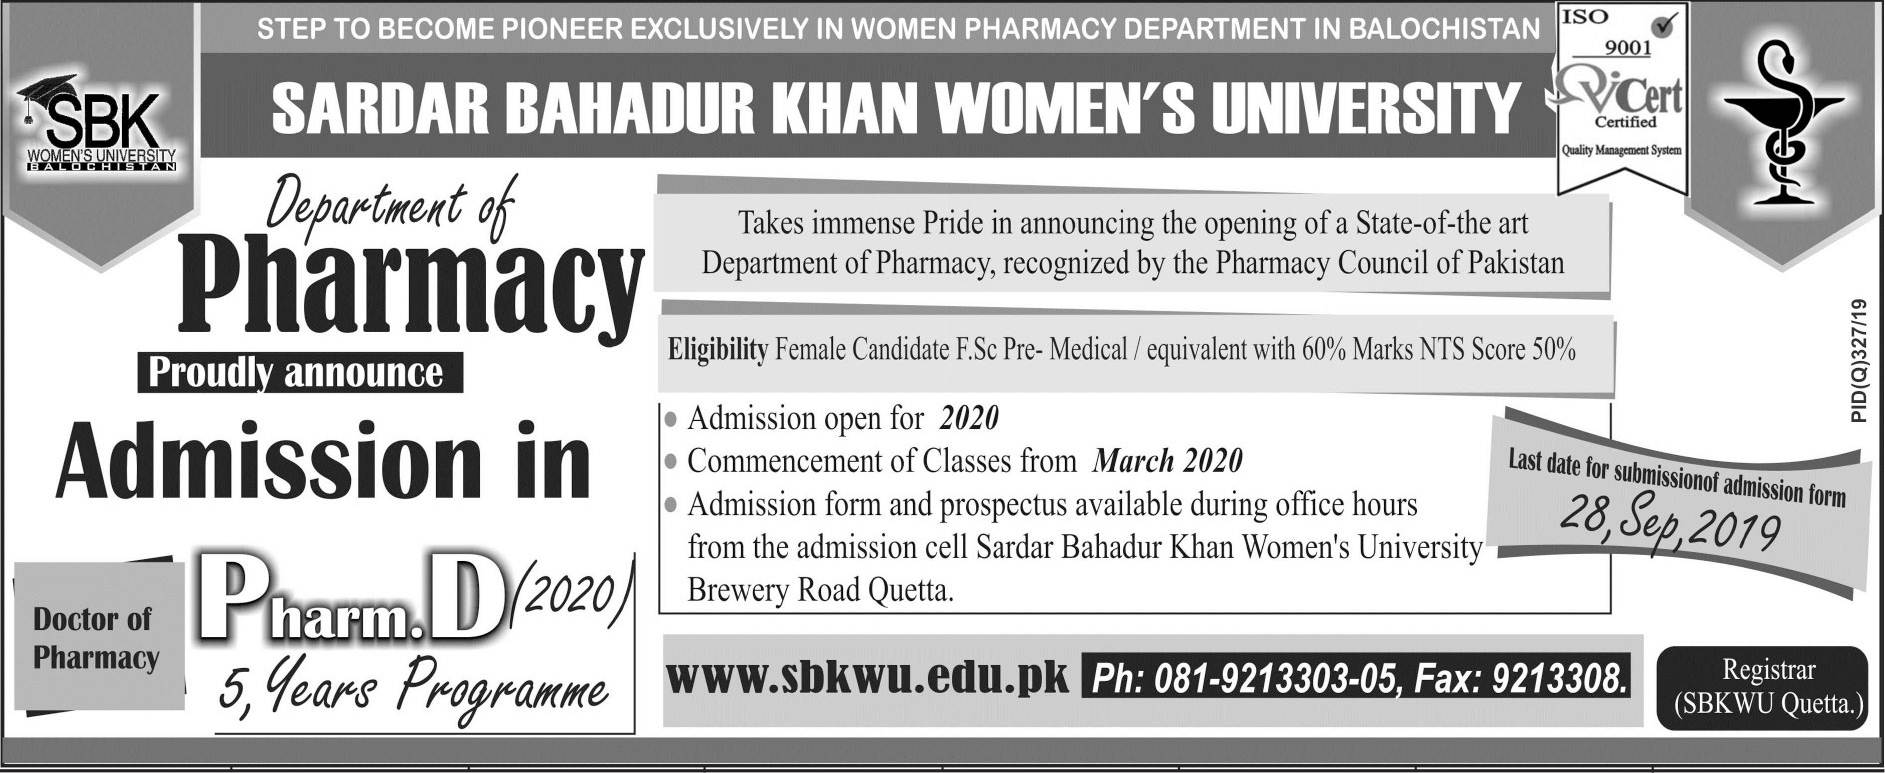 SBK Women University (SBKWU) Pharm D Admission 2020